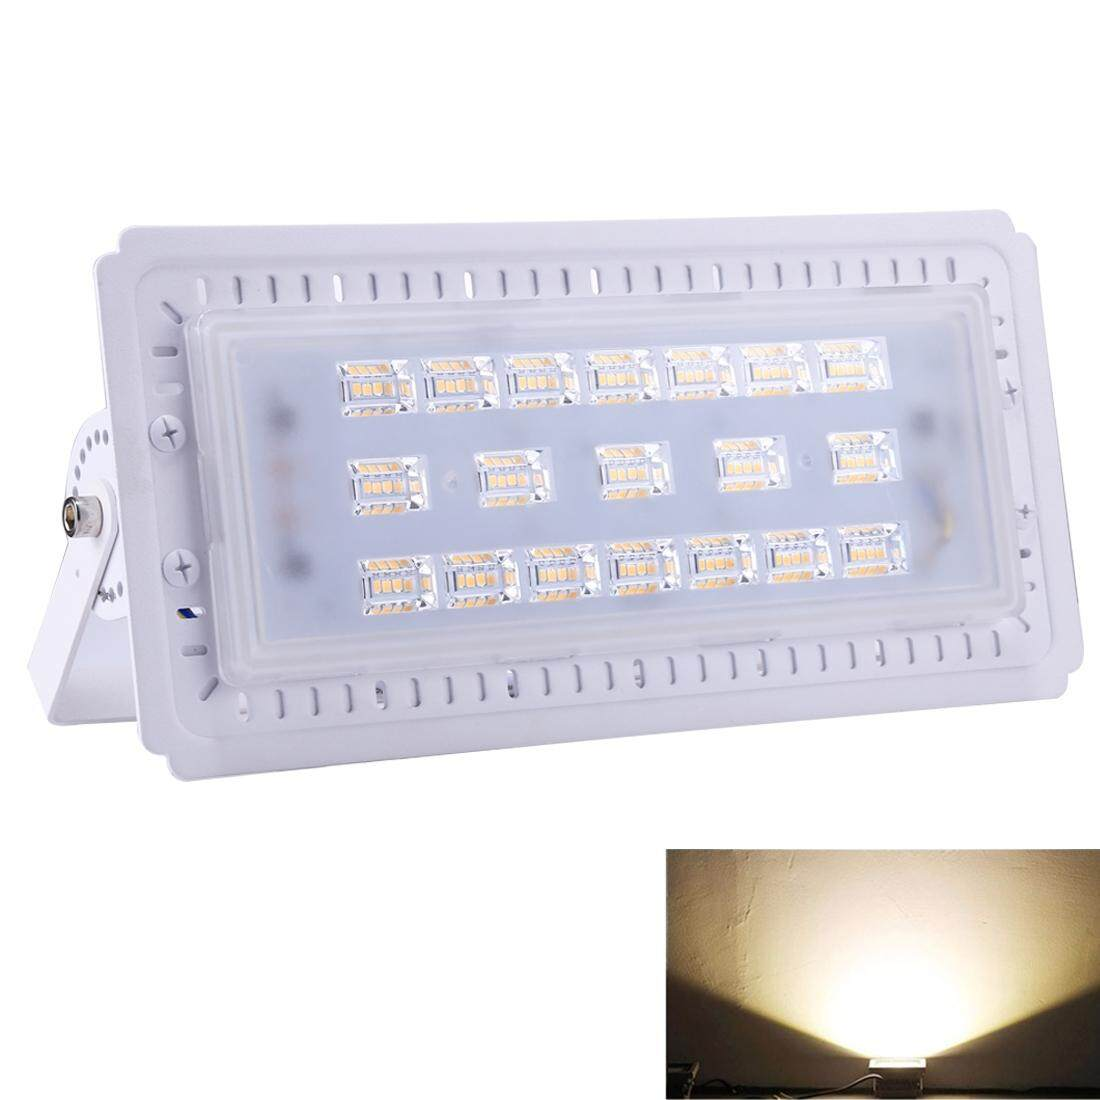 50W 228 LEDs SMD 2835 IP65 Waterproof Warm White Light Ultra-thin Linear LED Flood Light, AC 165-265V(White) - intl